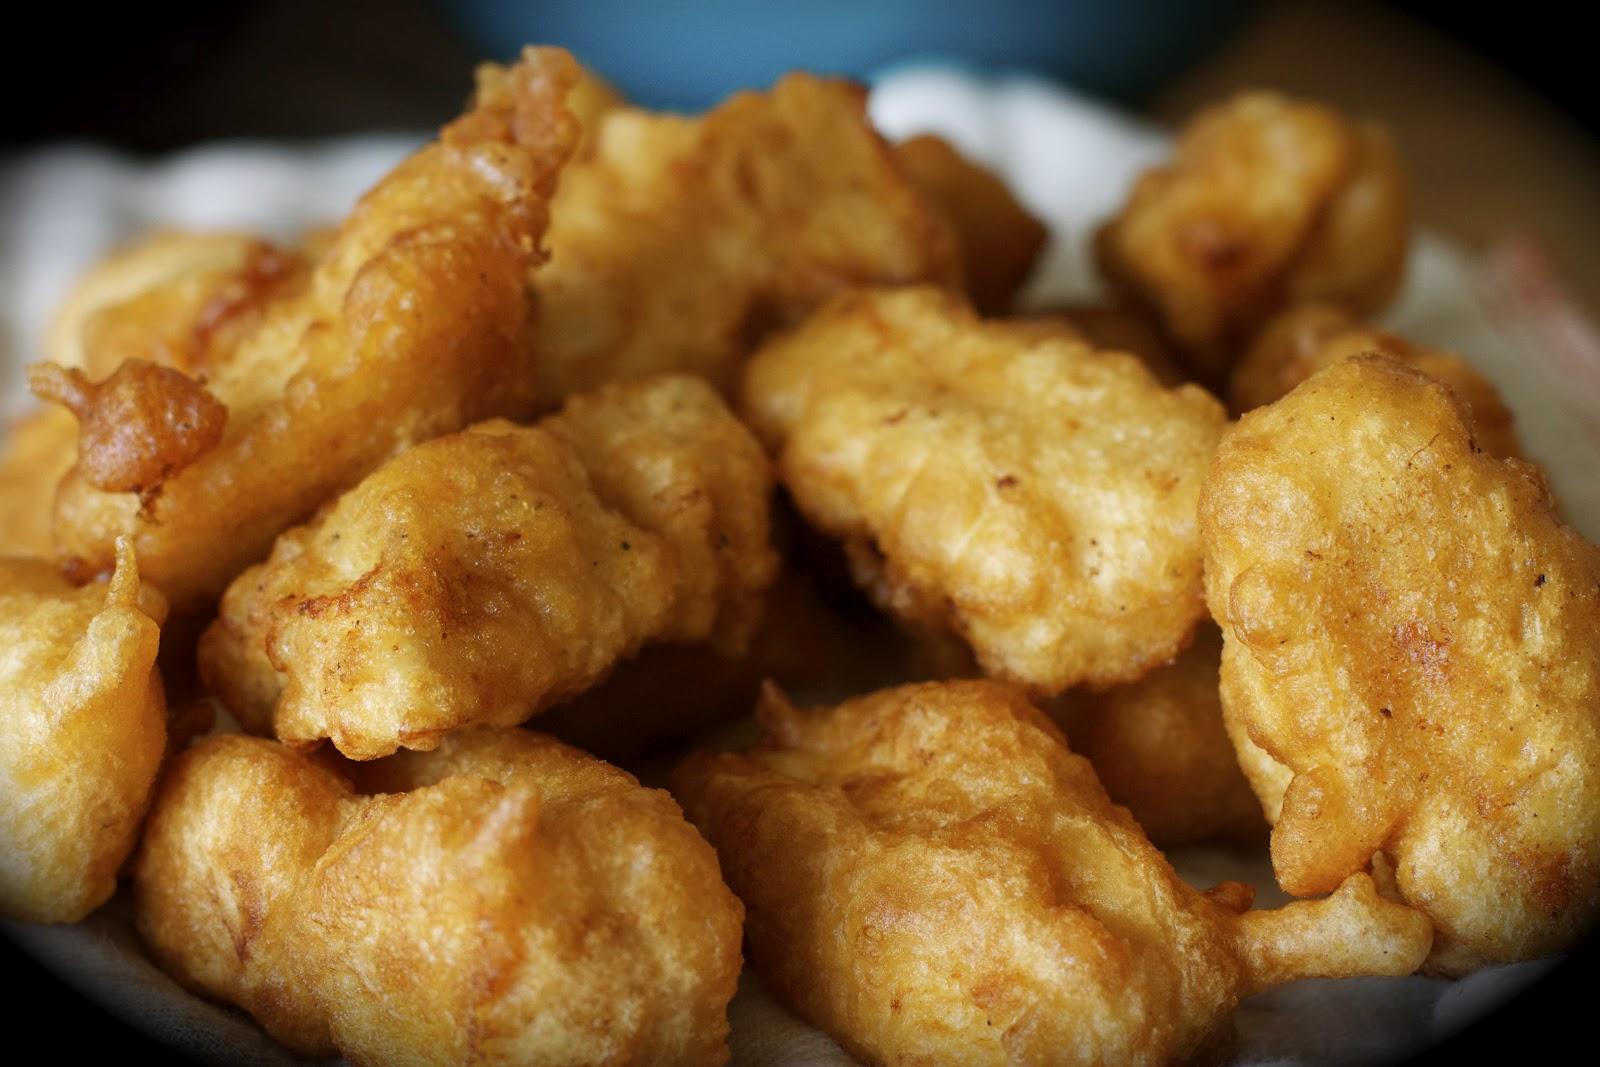 Beer batter fish recipe panlasang pinoy recipes for Beer batter fish recipe